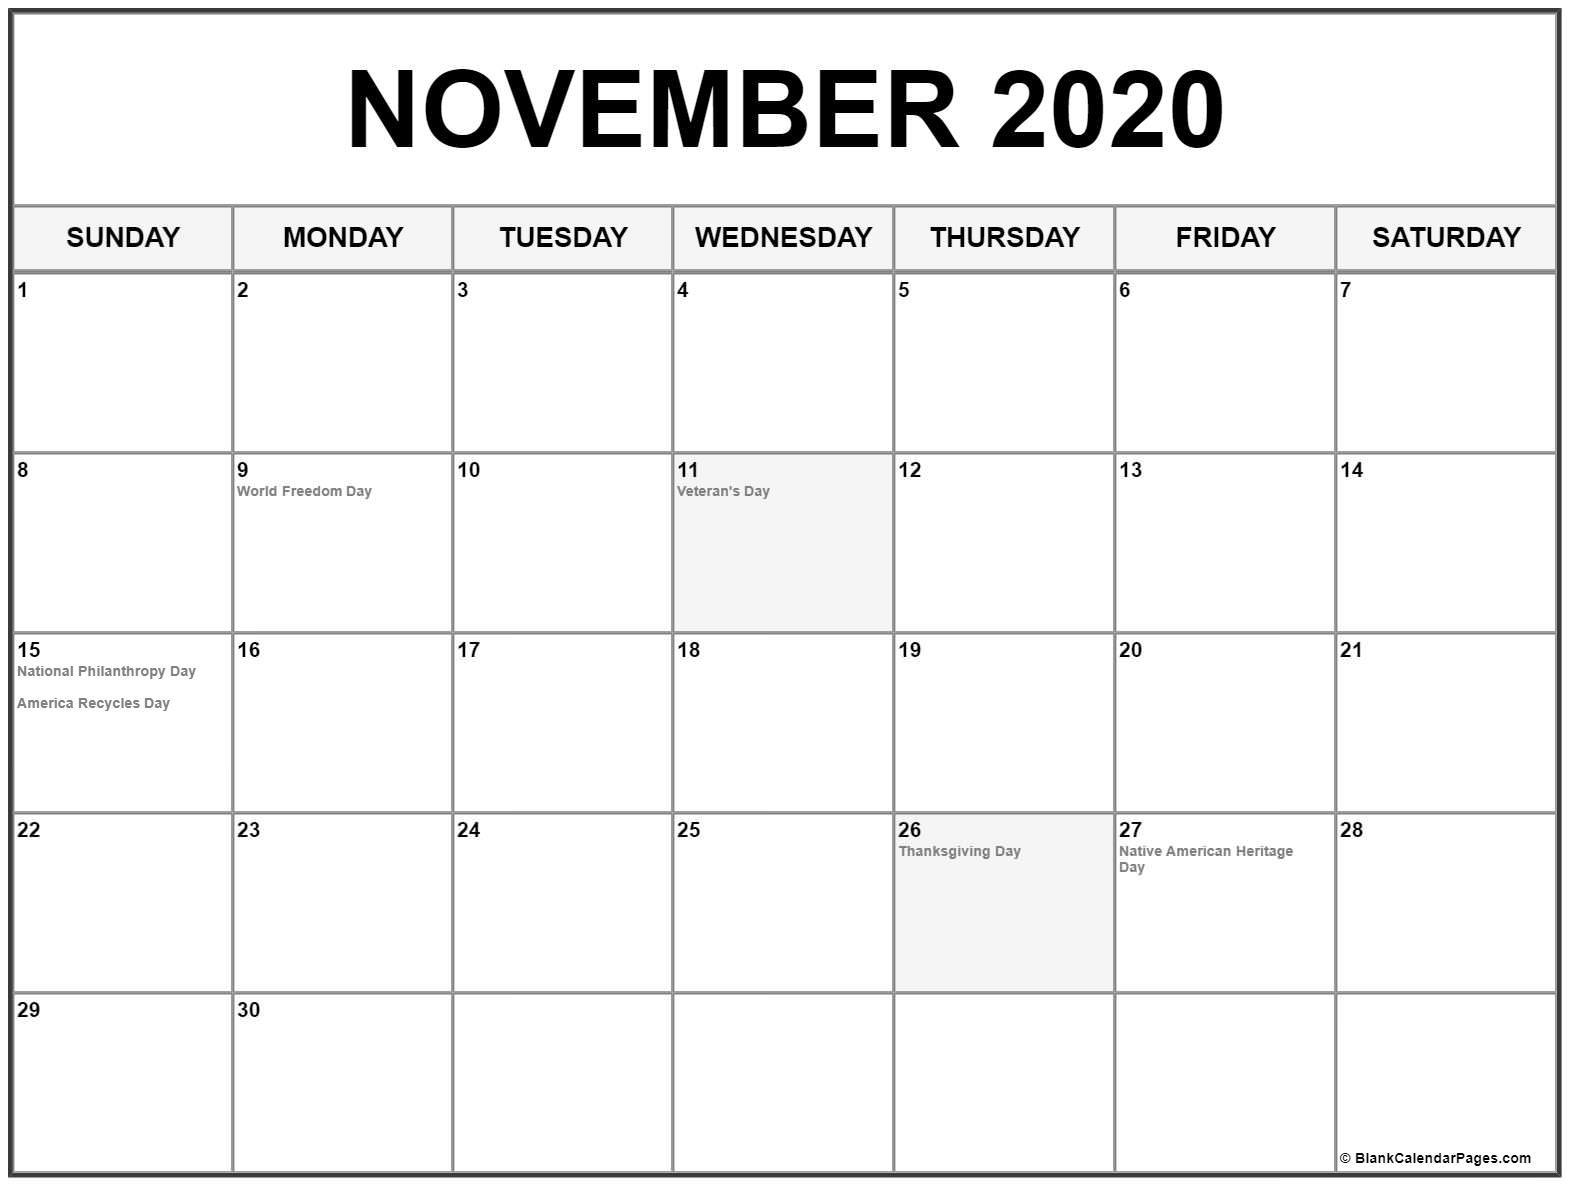 November 2020 Calendar Printable with Holidays November 2020 Calendar with Holidays